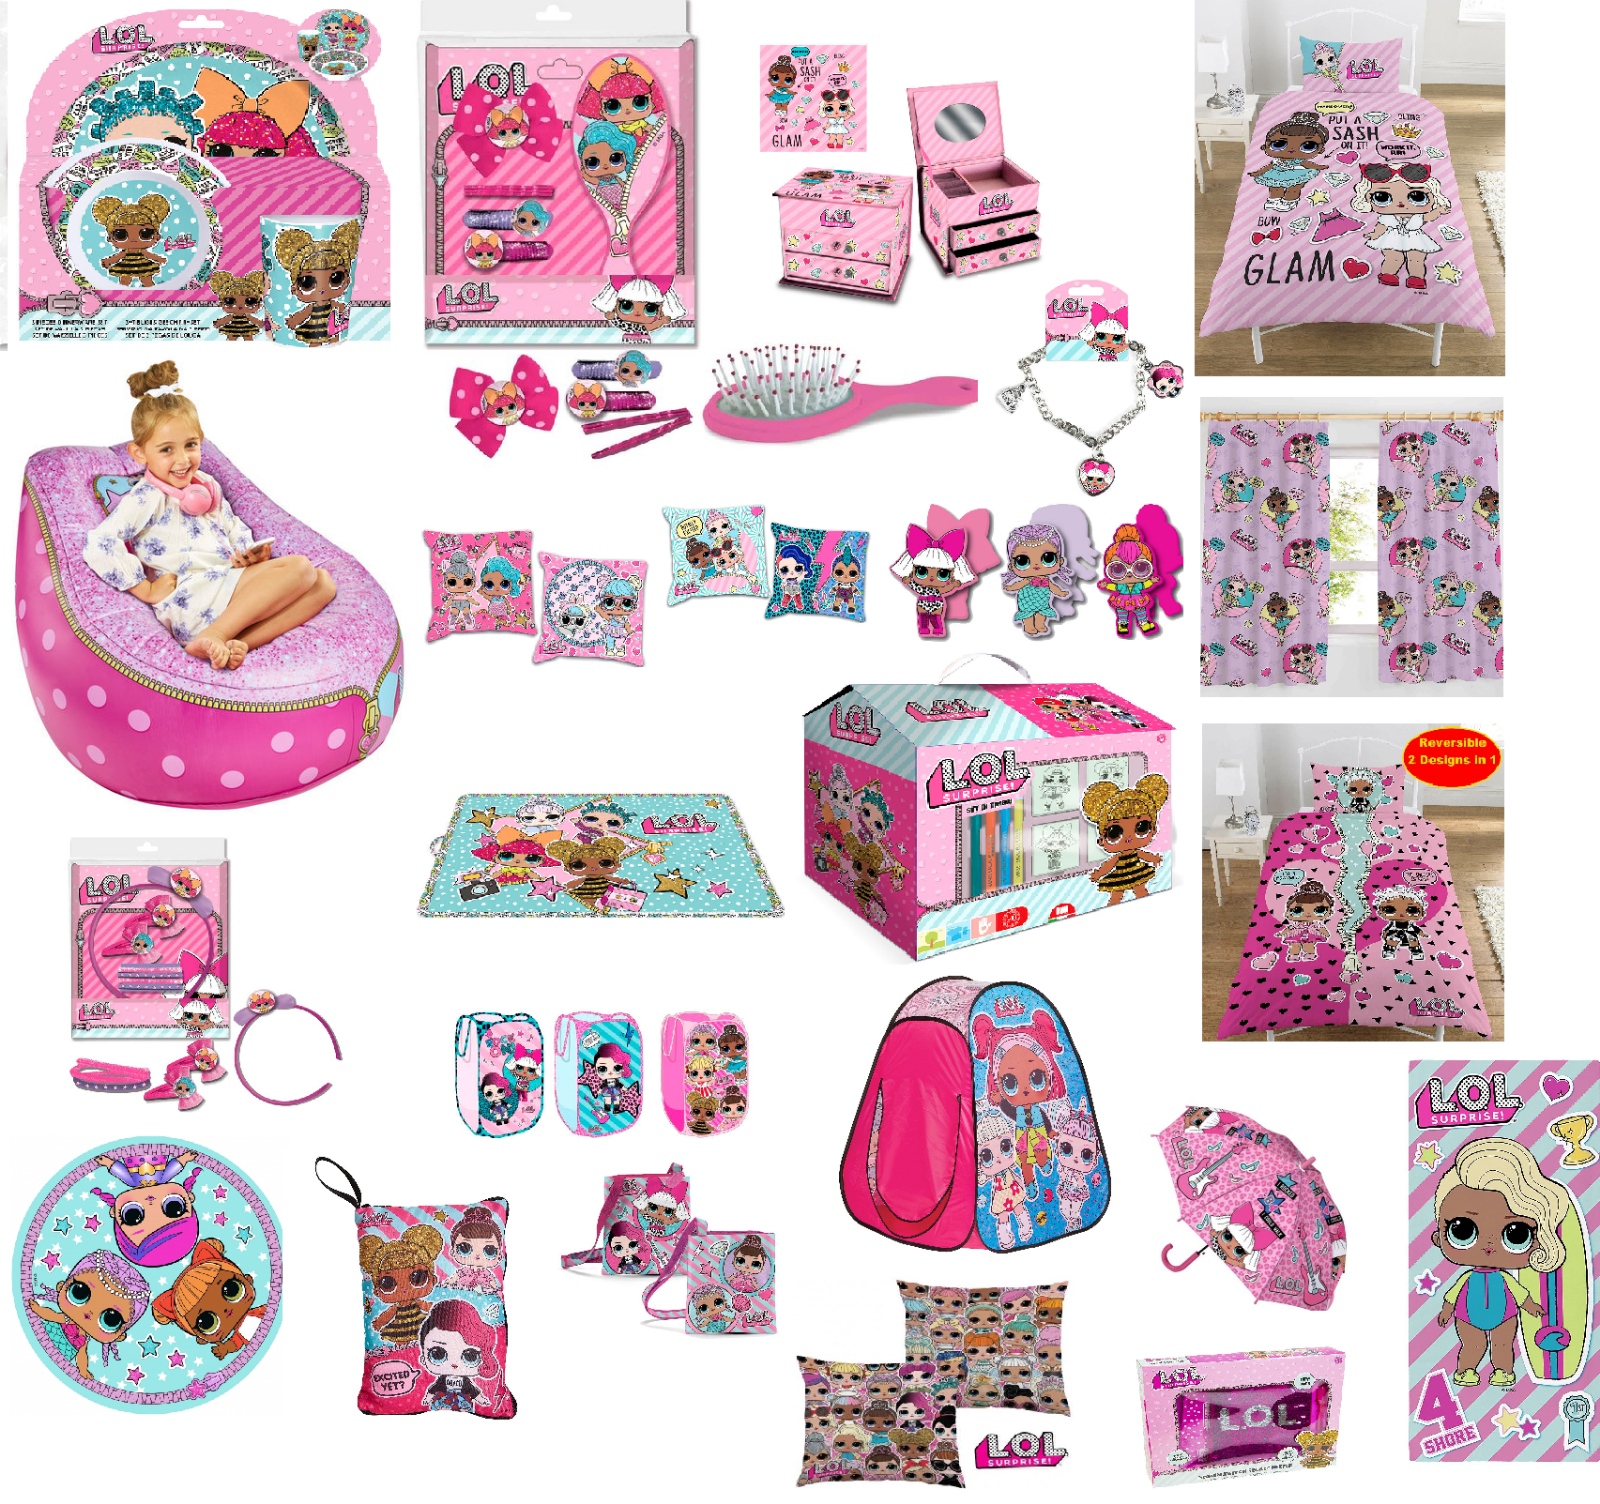 Children's Lol Surprise Pink Accessories Activity Dinner Party Gift Idea Bedding 3